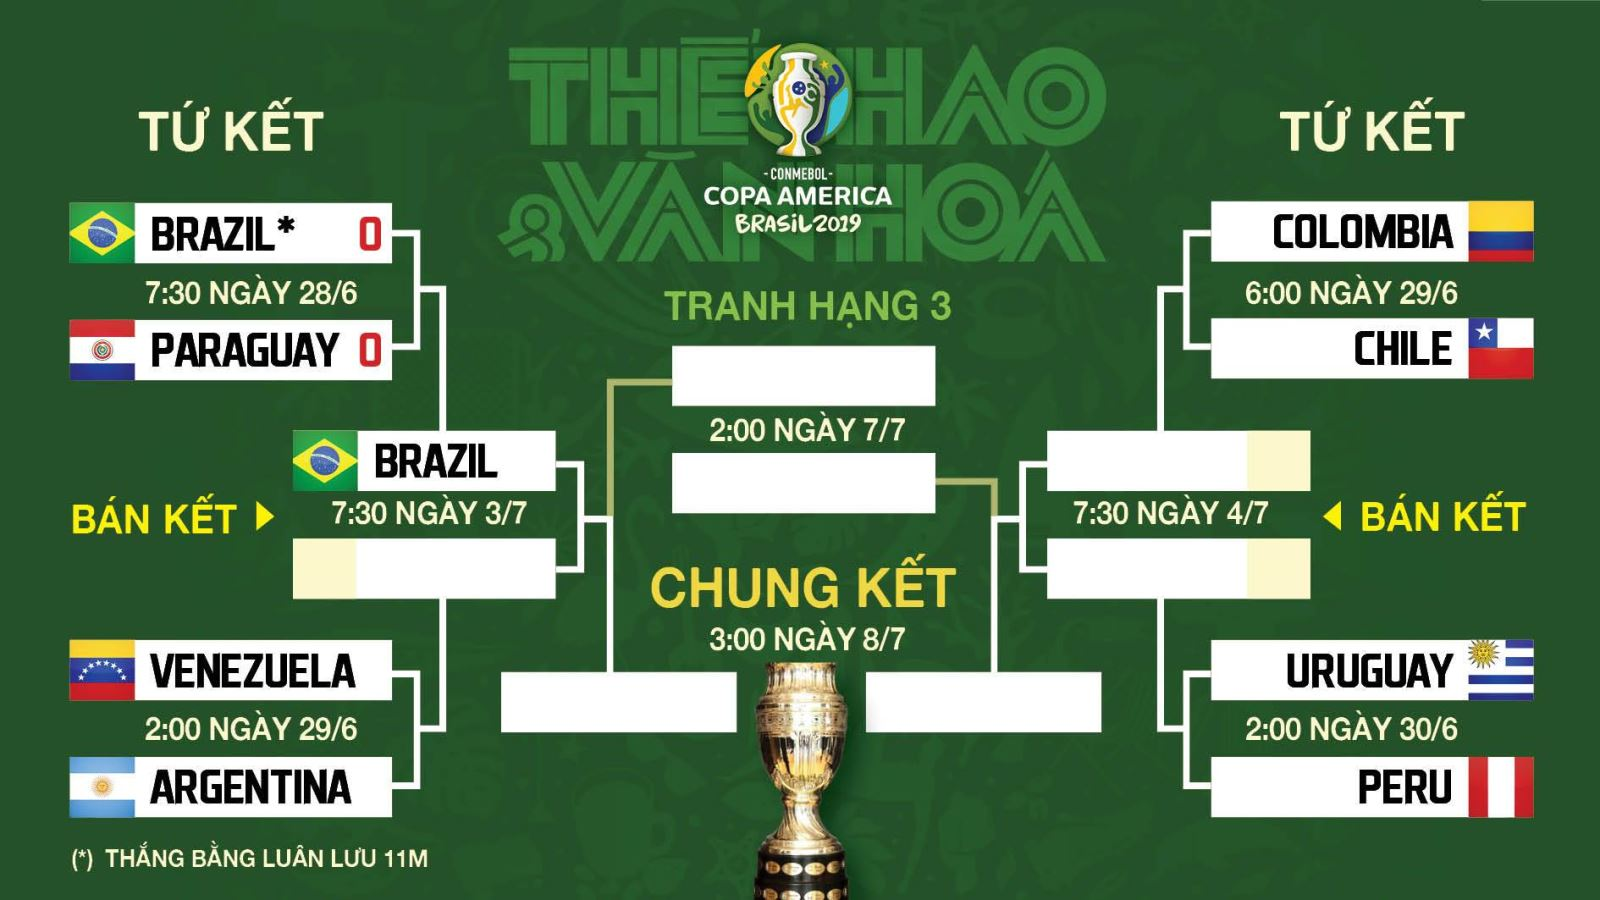 trực tiếp bóng đá, Argentina vs Venezuela truc tiep, Venezuela đấu với Argentina, Argentina, trực tiếp bóng đá hôm nay, truc tiep bong da, truc tiep Copa America 2019